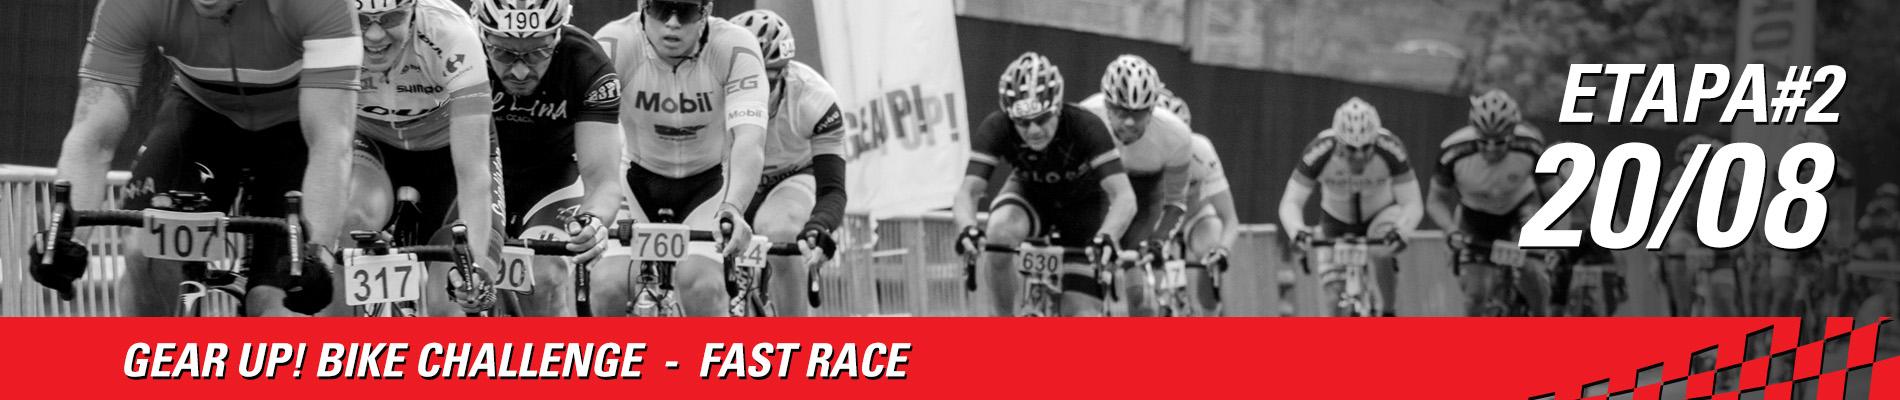 GEAR UP! BIKE CHALLENGE - FAST RACE ETAPA 2  - Imagem de topo